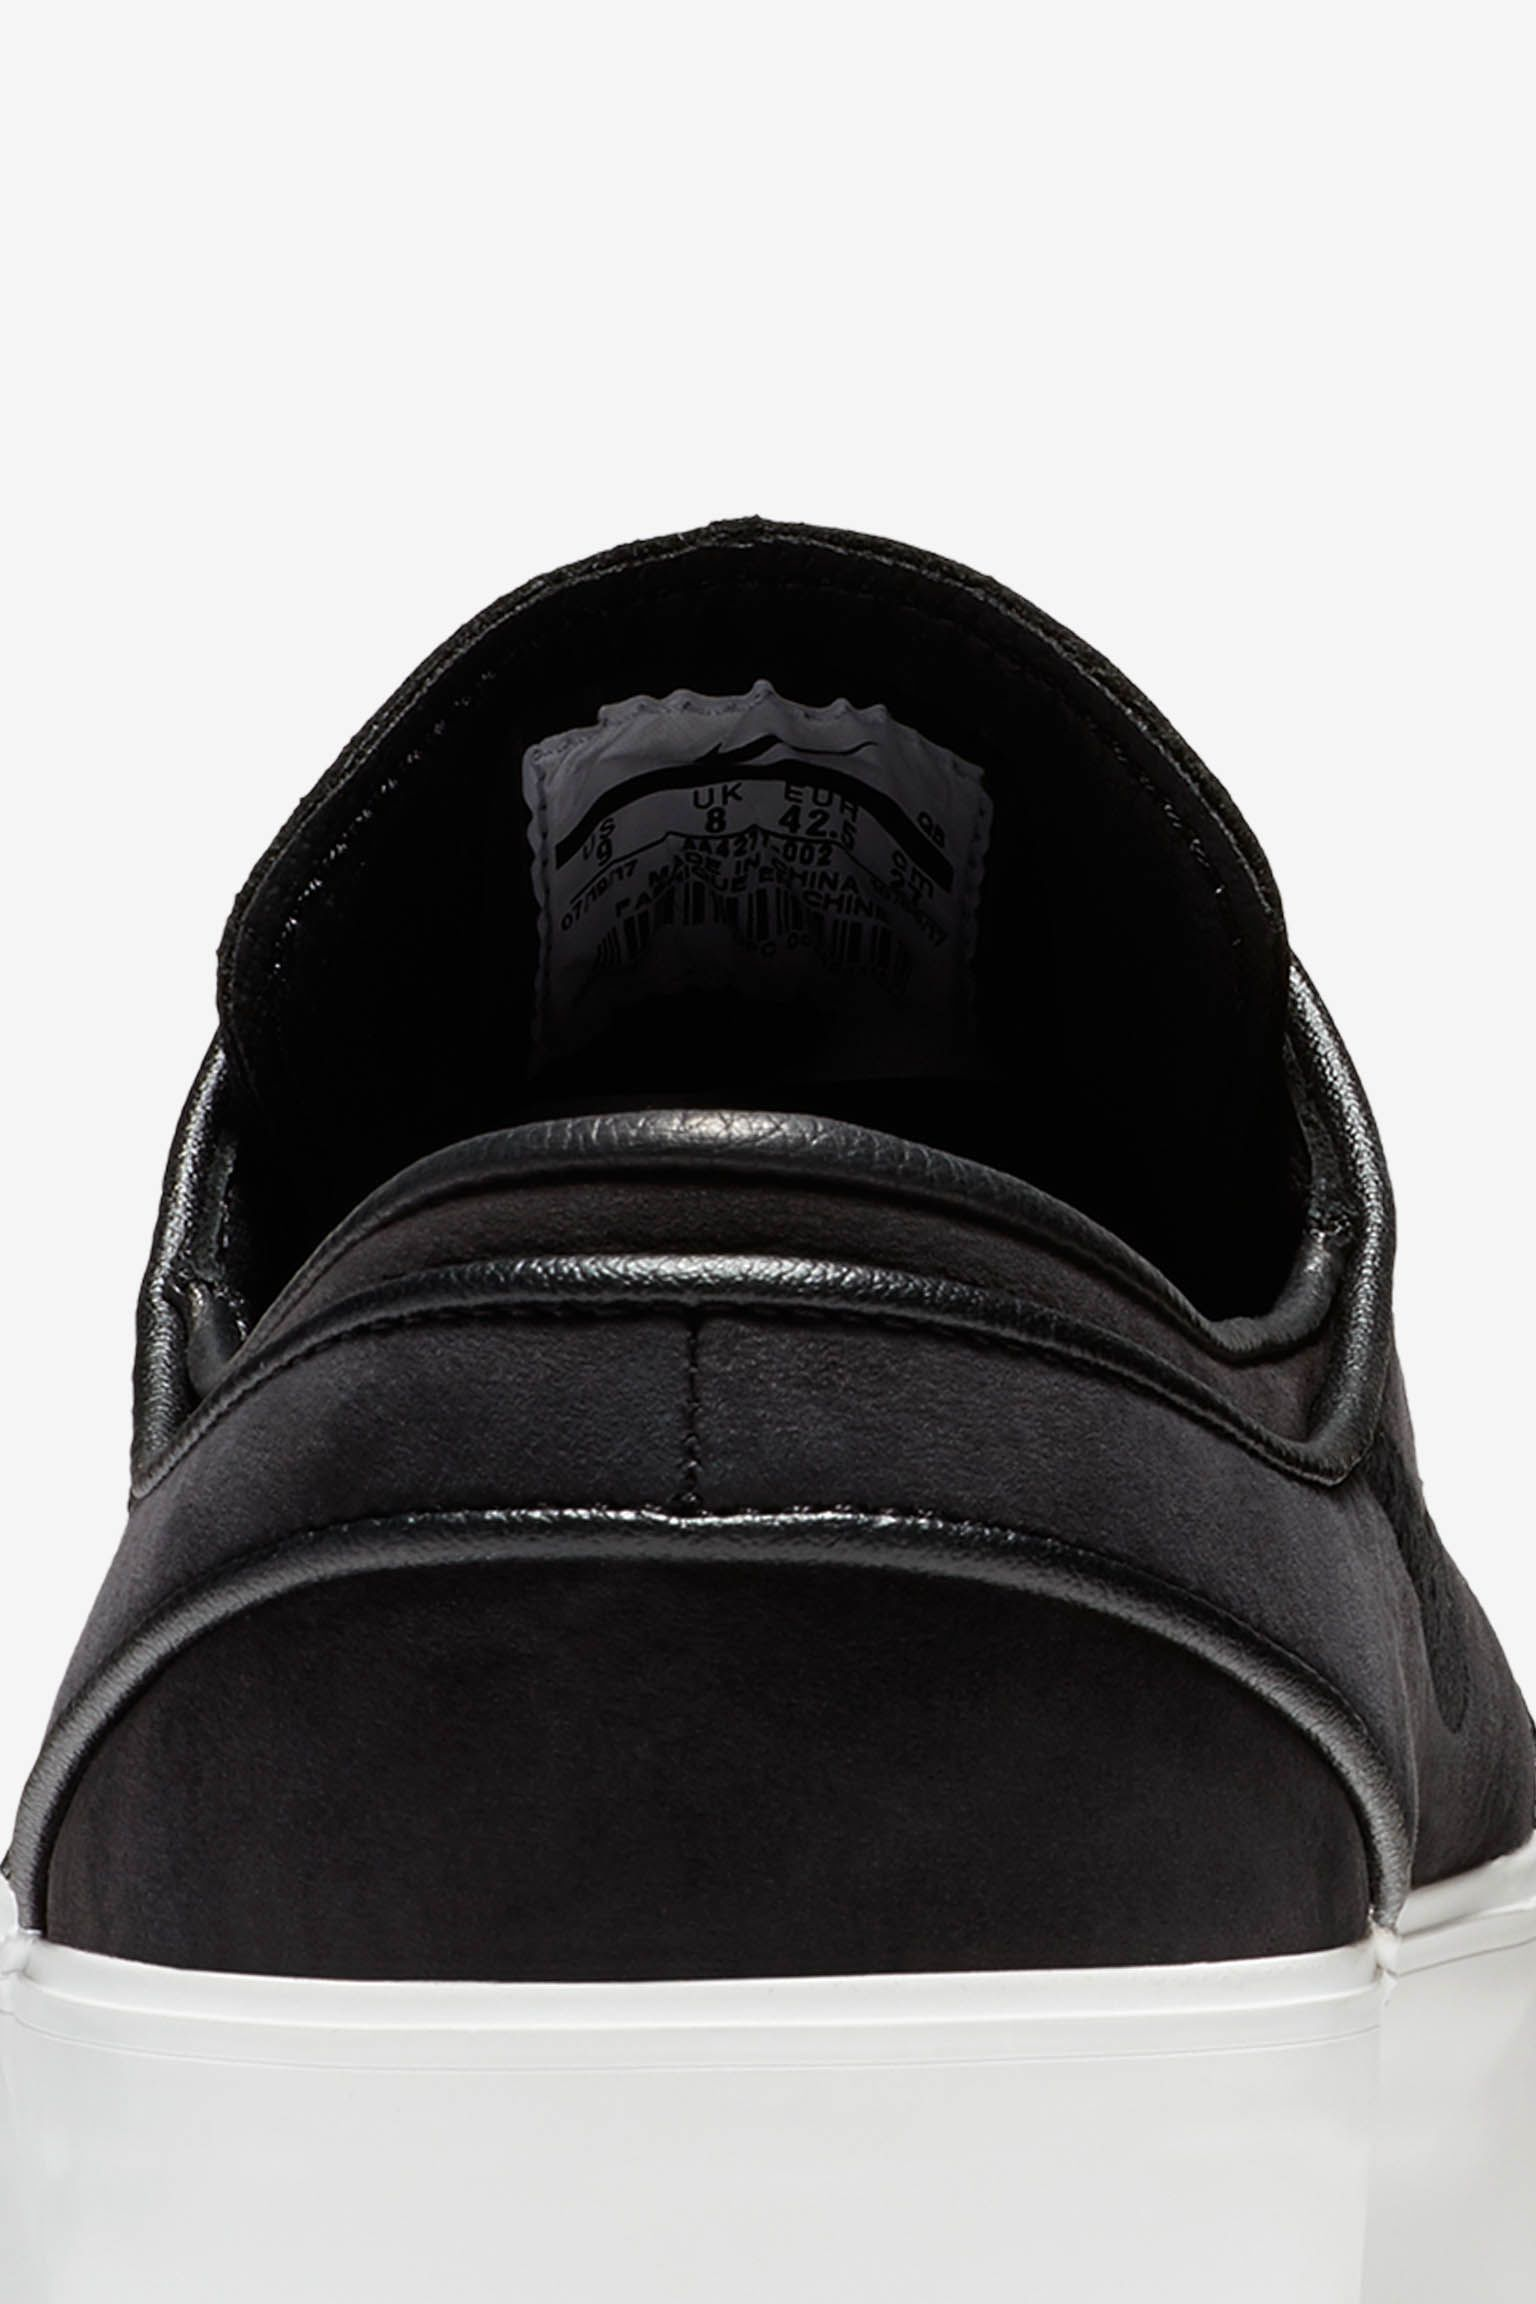 【NIKE公式】ナイキ SB ジャノスキー デコン 'Black & Anthracite' (AA4277-002 / Janoski)